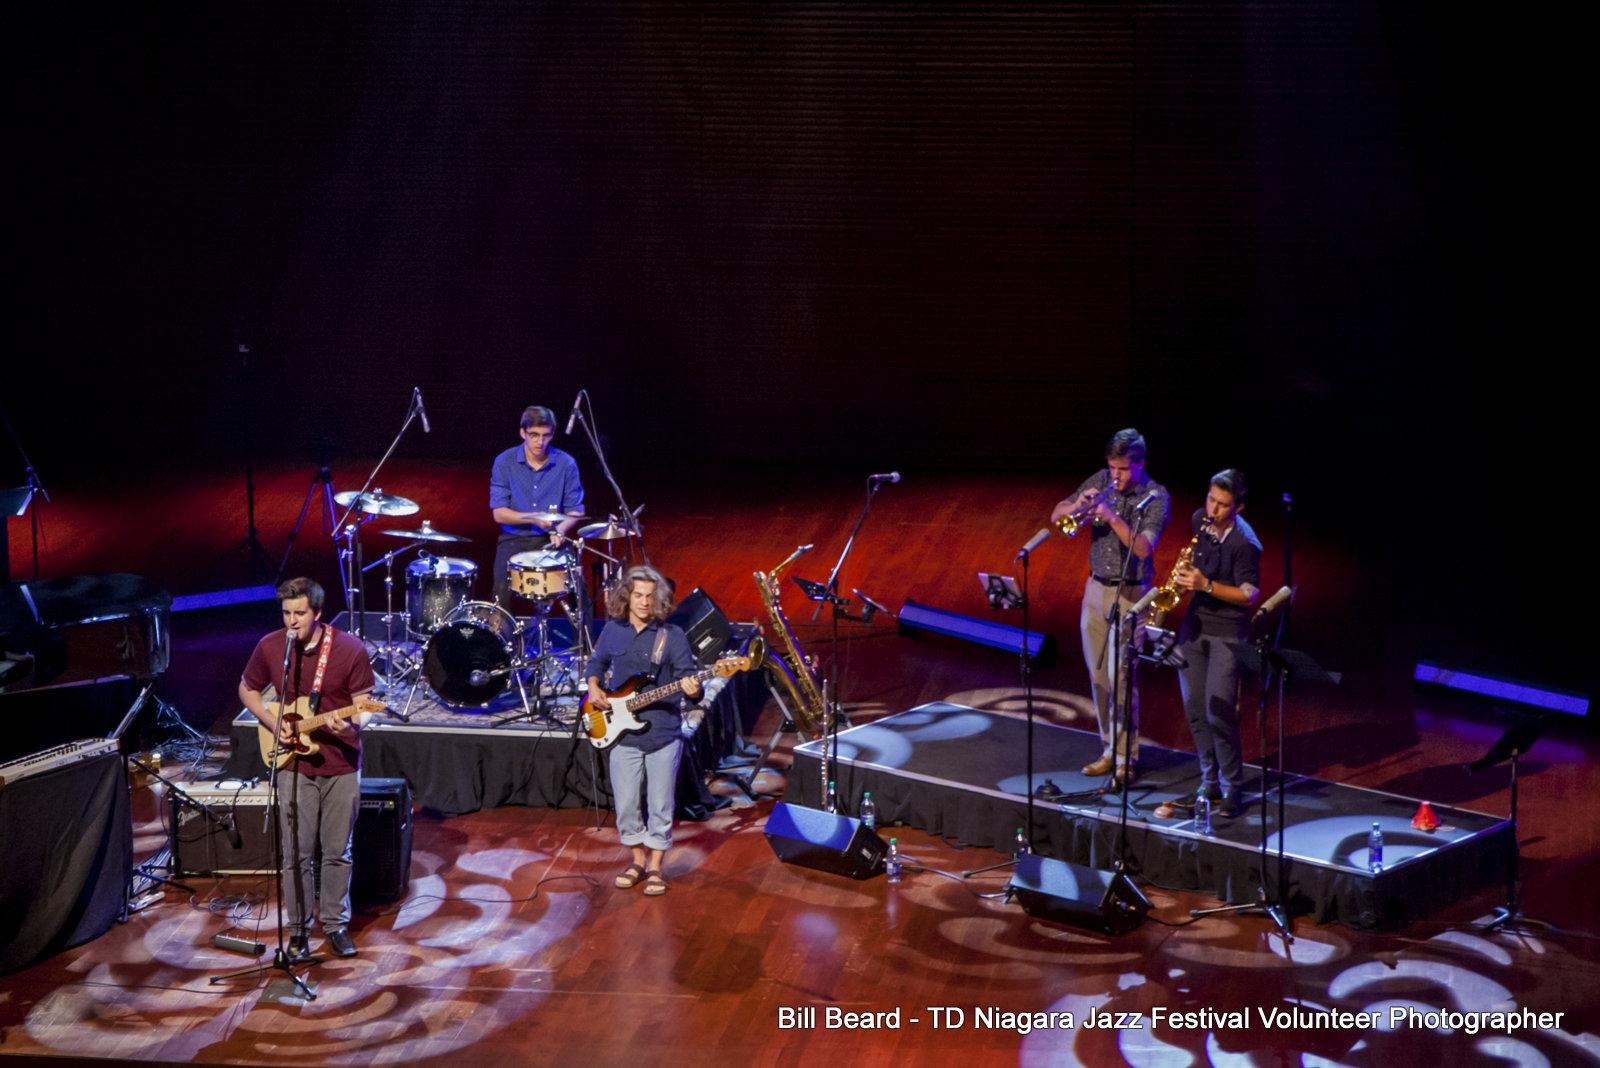 JAZZ in the CITY - Friday, July 28th, 2017 - Youth Band: 4 Beats Behind - FirstOntario Performing Arts Centre. Photo: Bill Beard